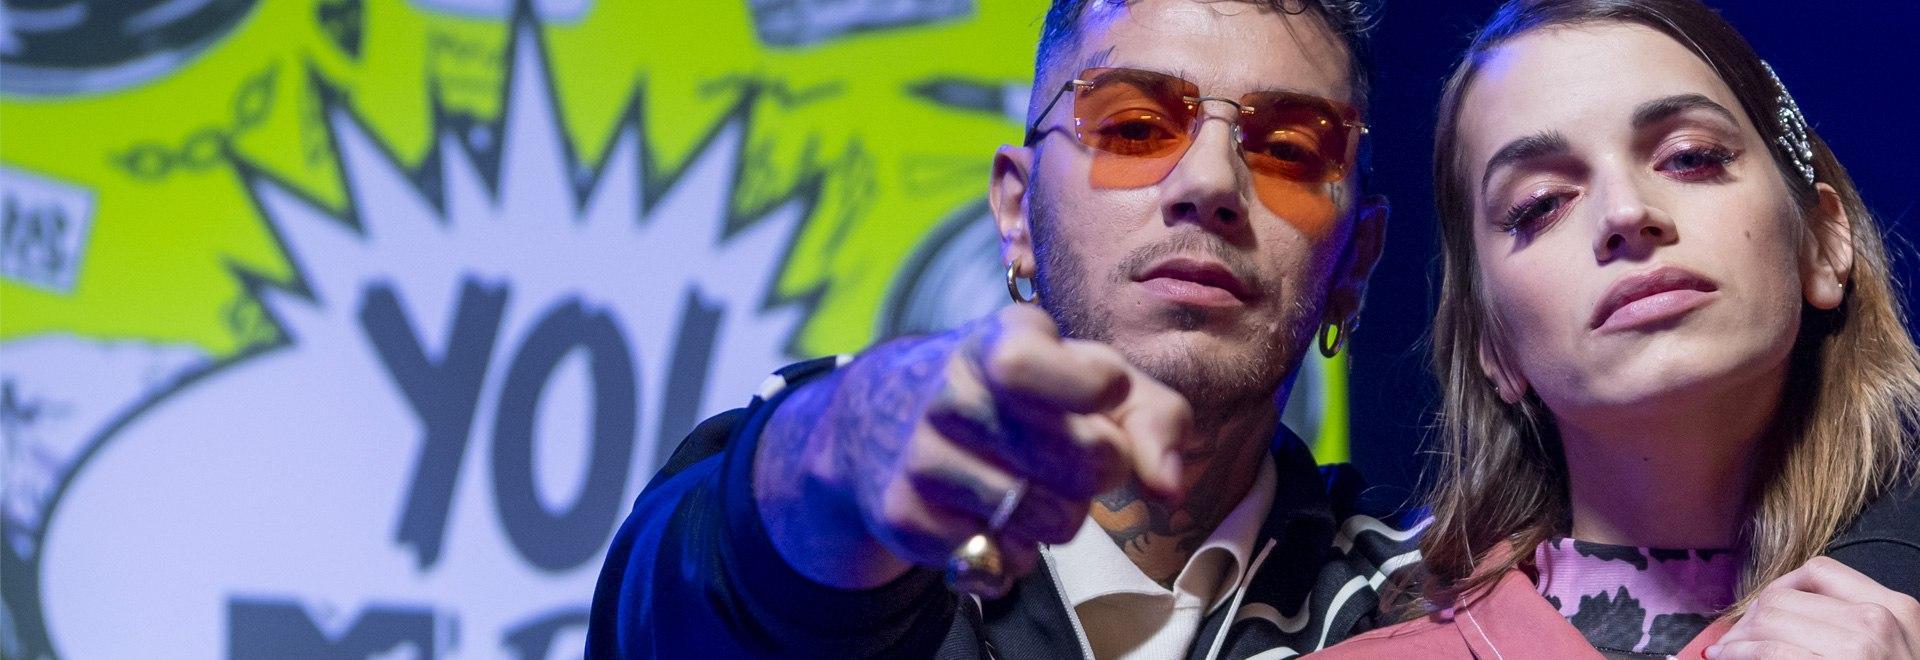 Yo! Mtv Raps - Le interviste